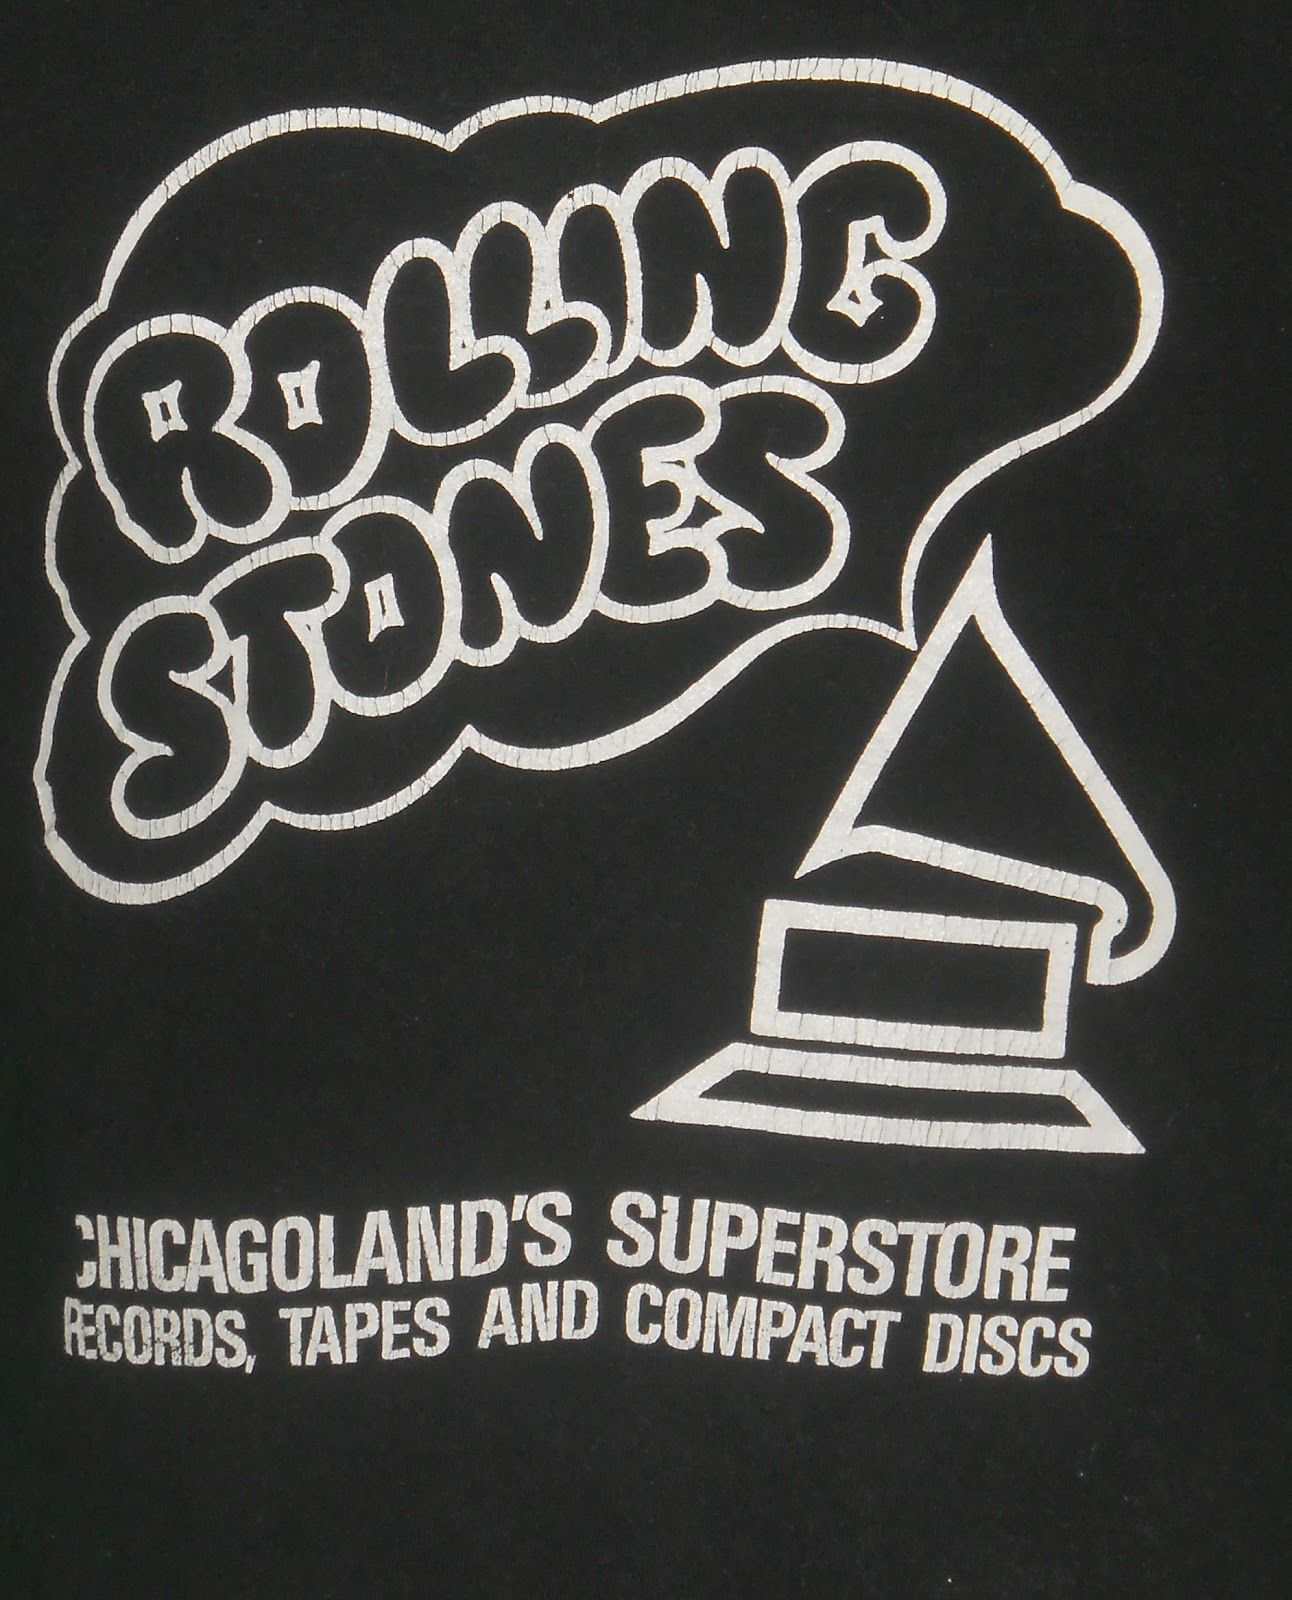 The Voodoo Vintage Rolling Stones Chicago Record Store Tee Record Store Vinyl Record Store Rolling Stones